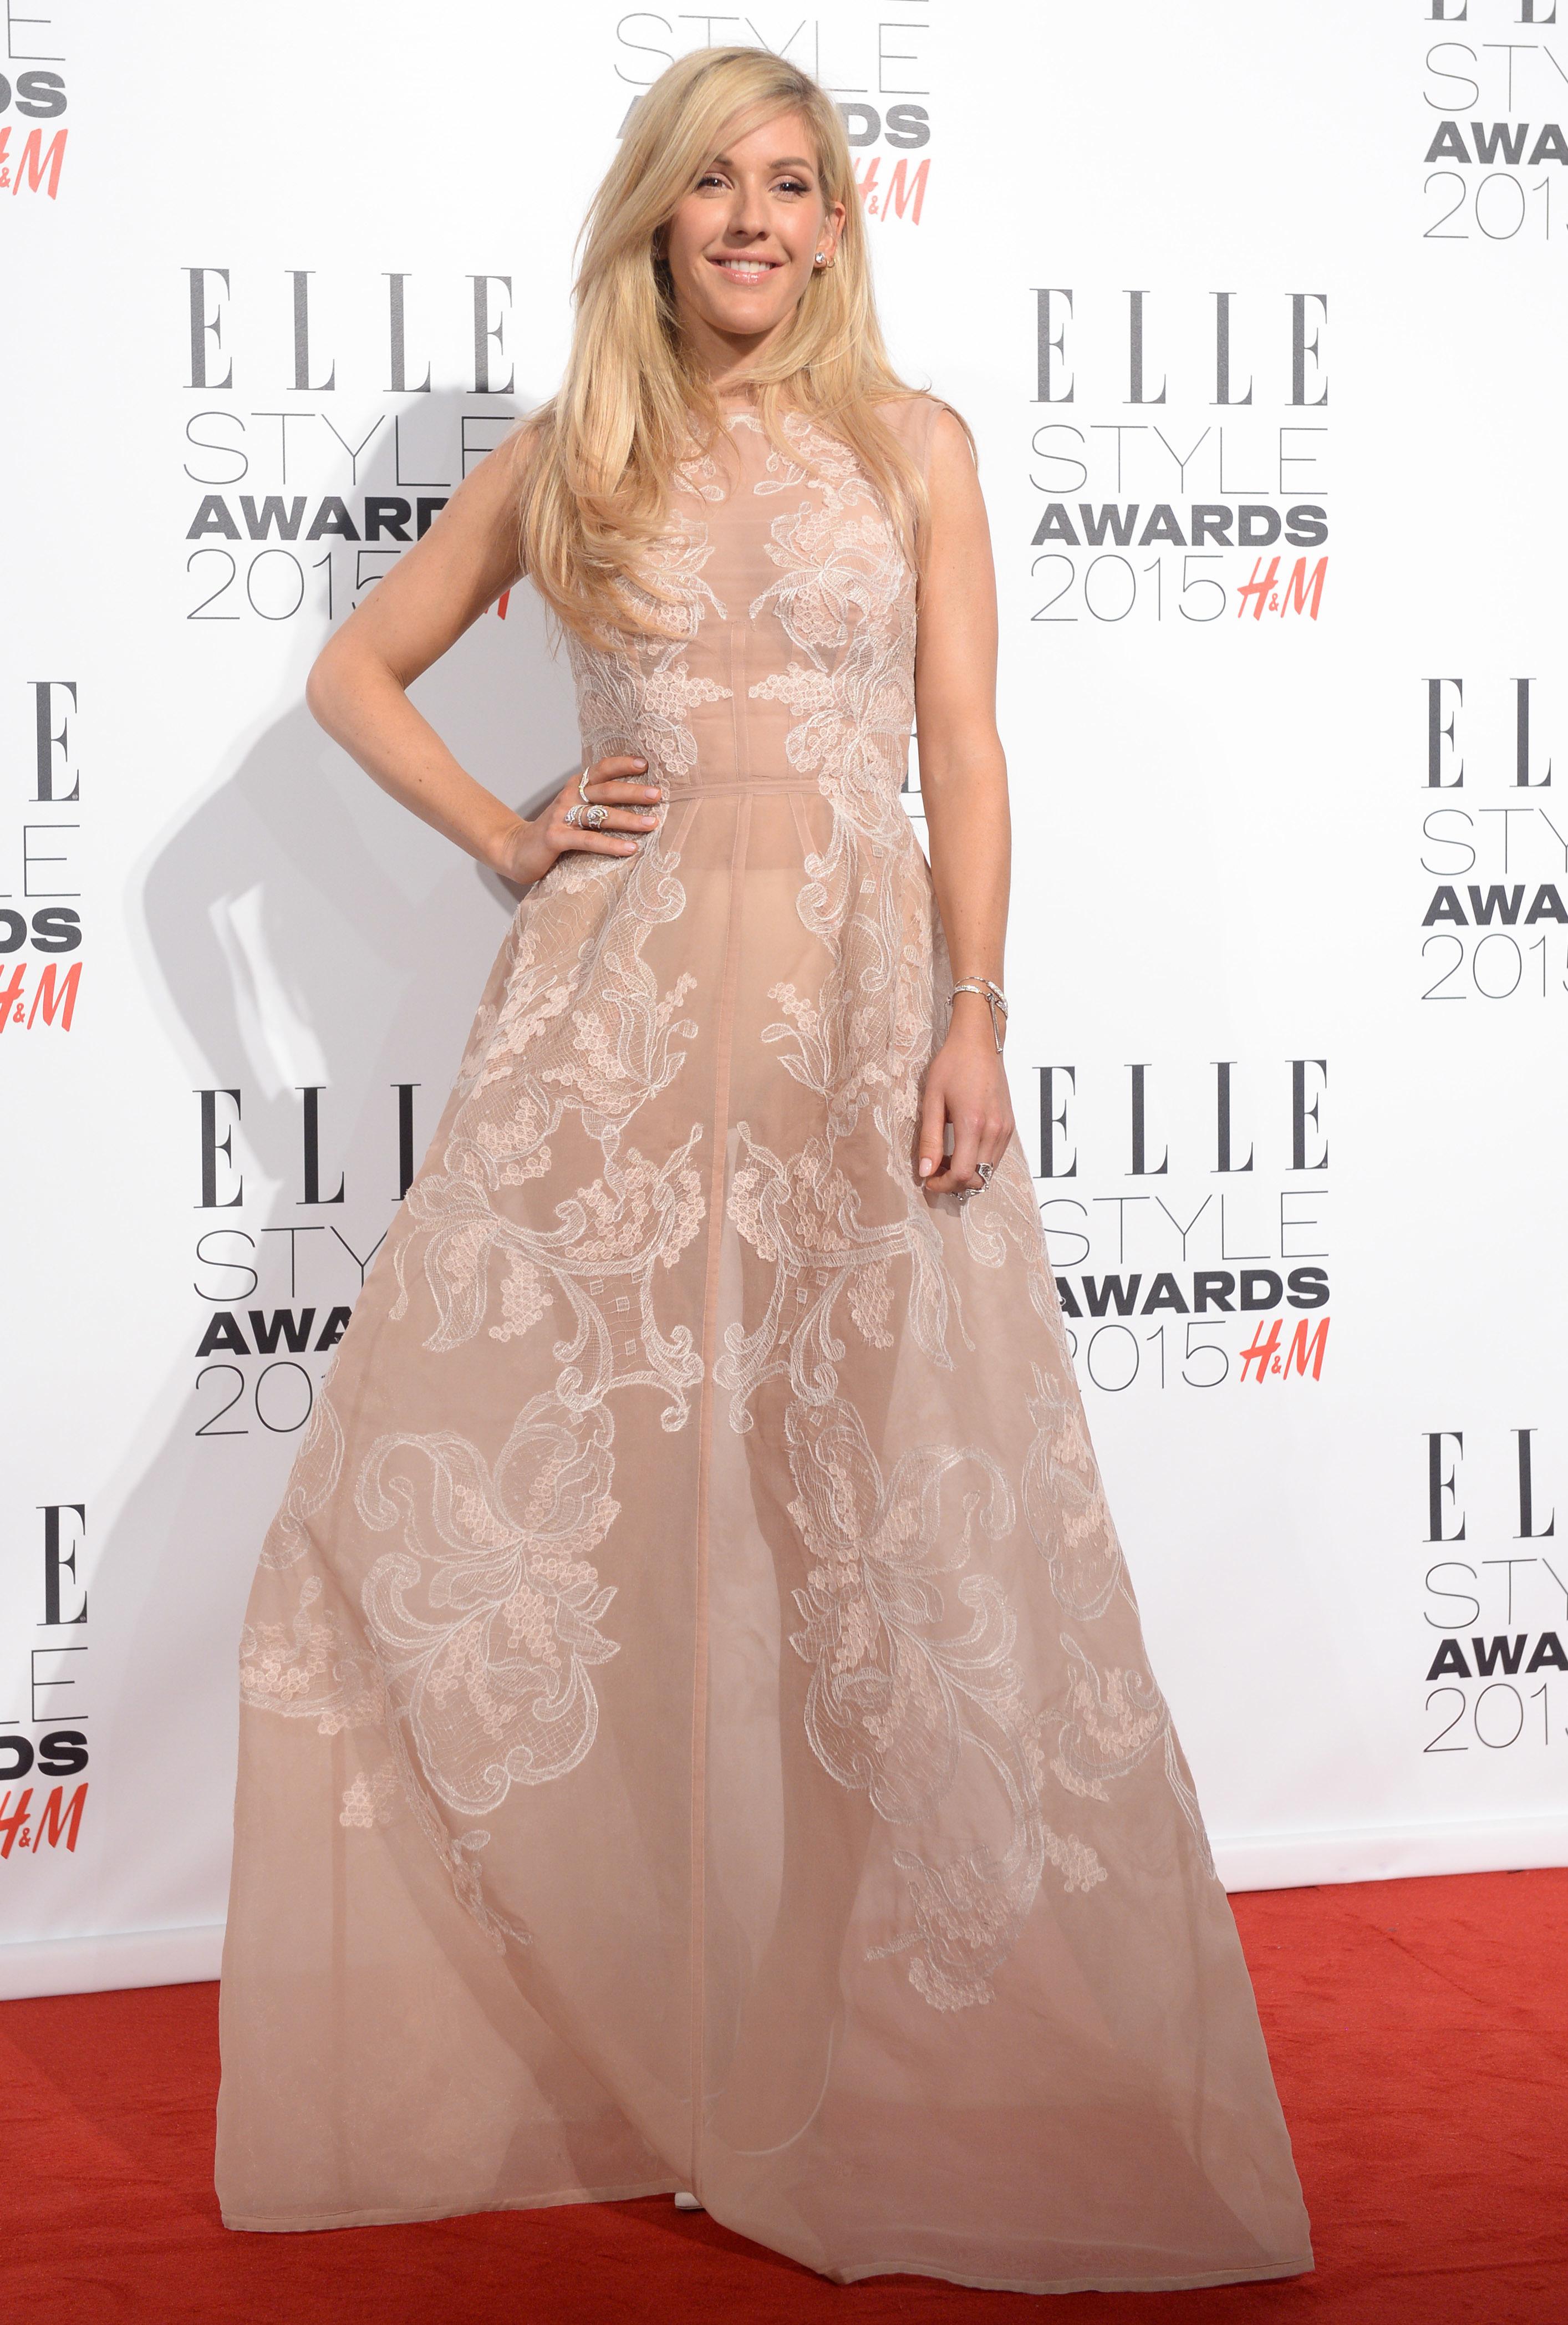 Ellie Goulding recalls a harrowing crash in Norway